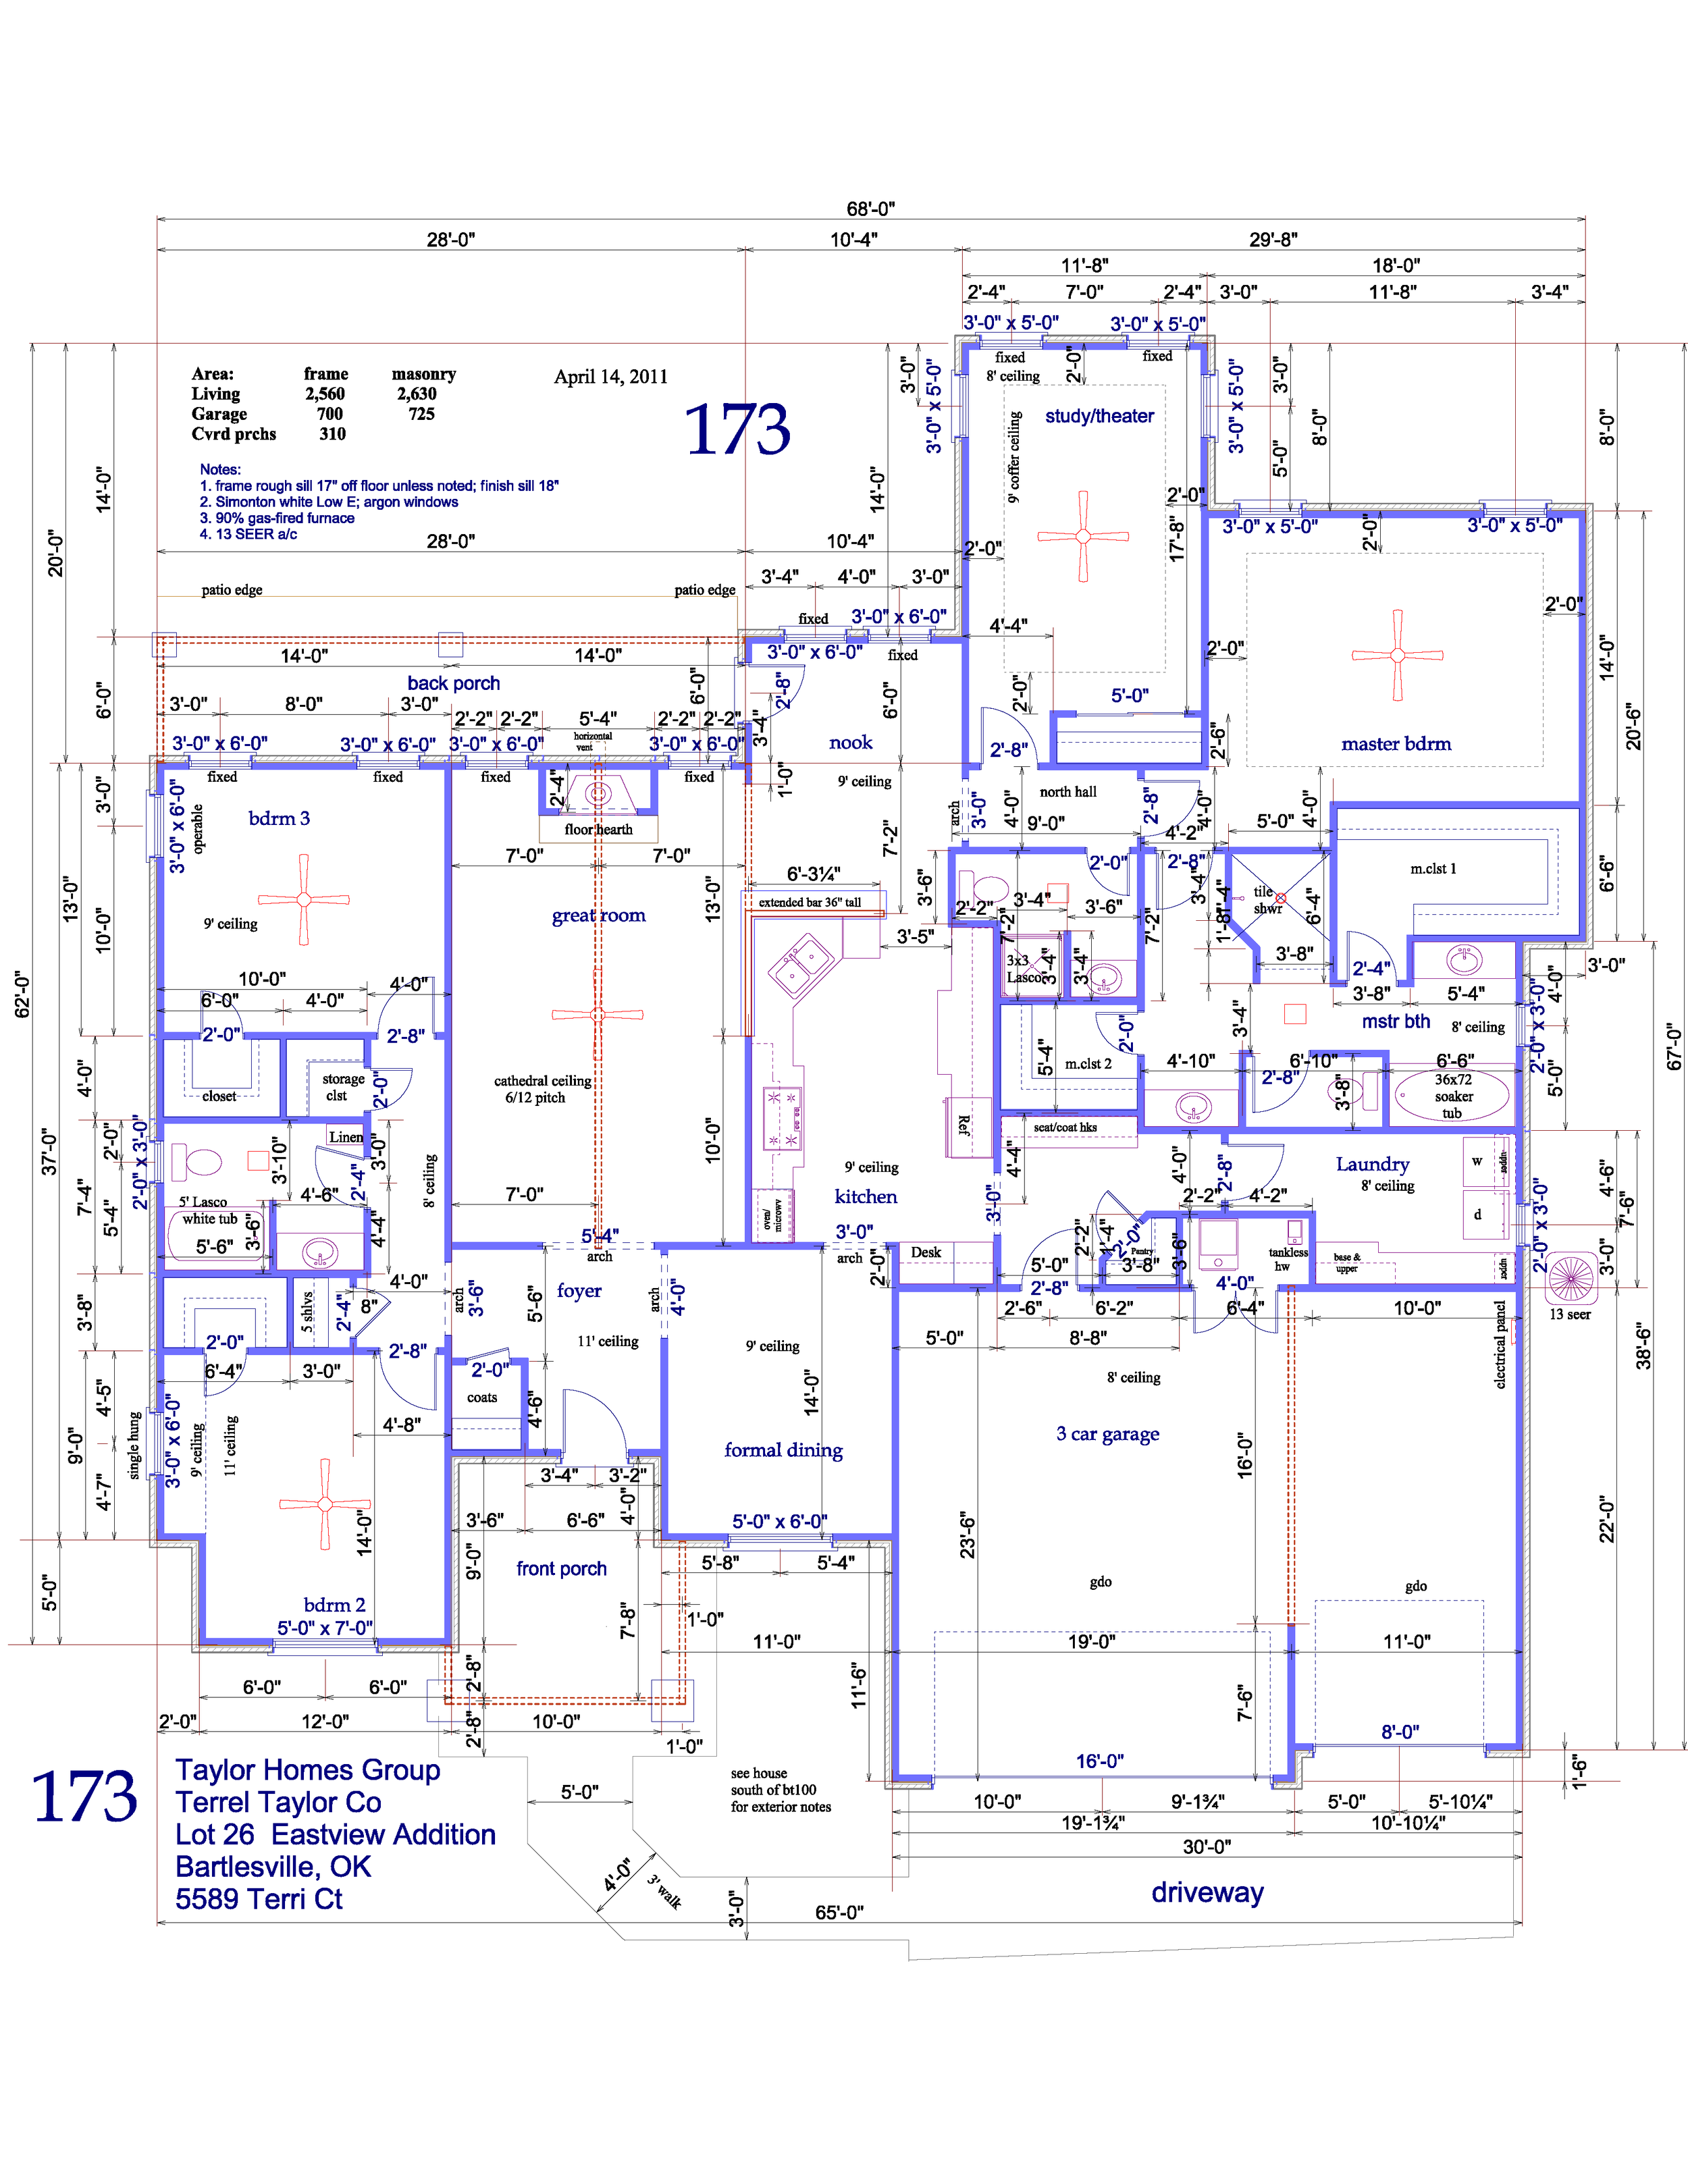 5589 Terri Ct floorplan.png